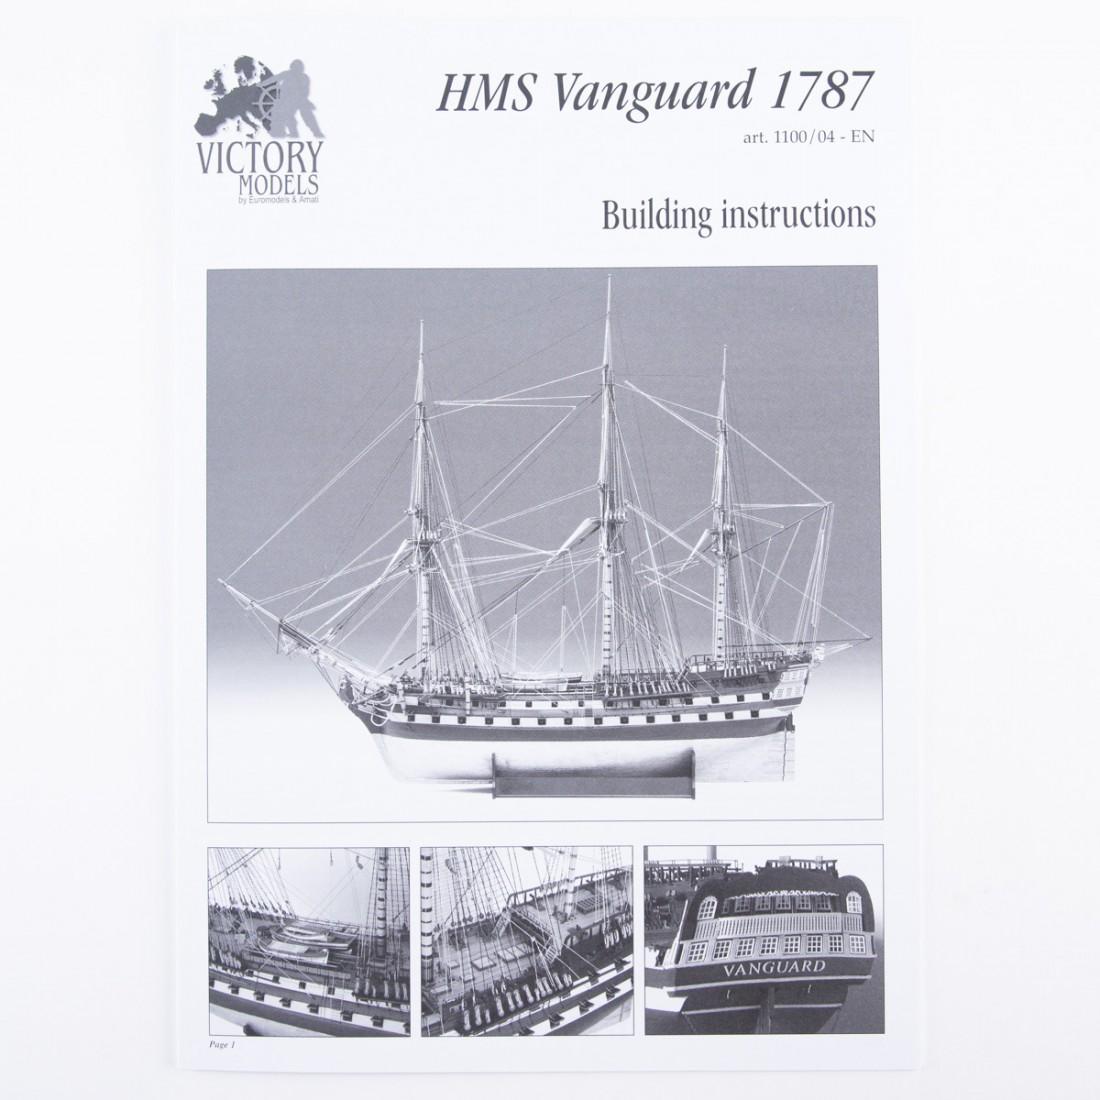 H.M.S. Vanguard 1787 Plan